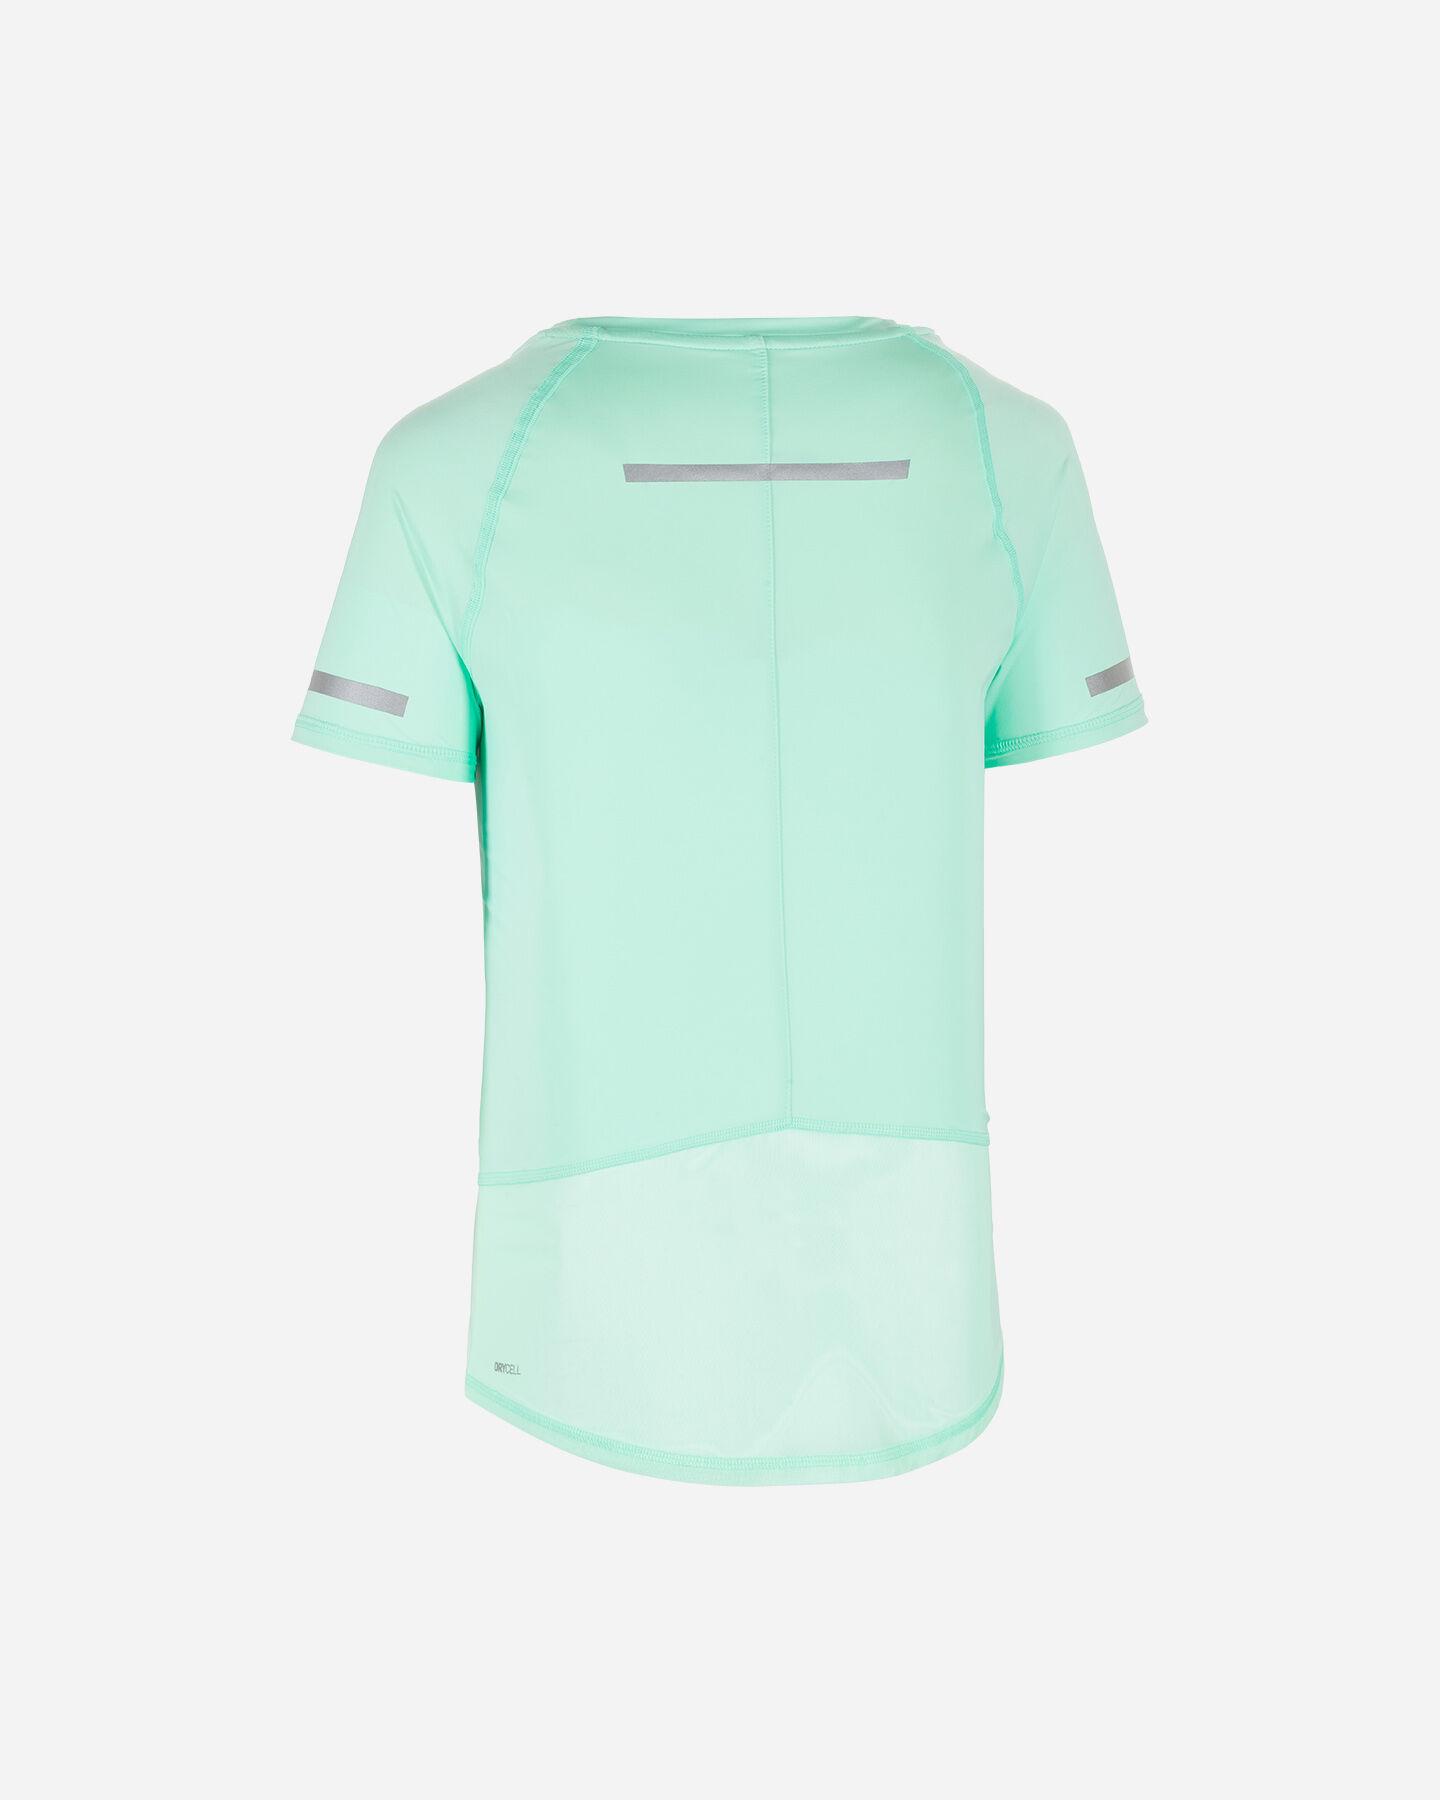 T-Shirt running PUMA RUN BIO MOTION W S5172919 scatto 1